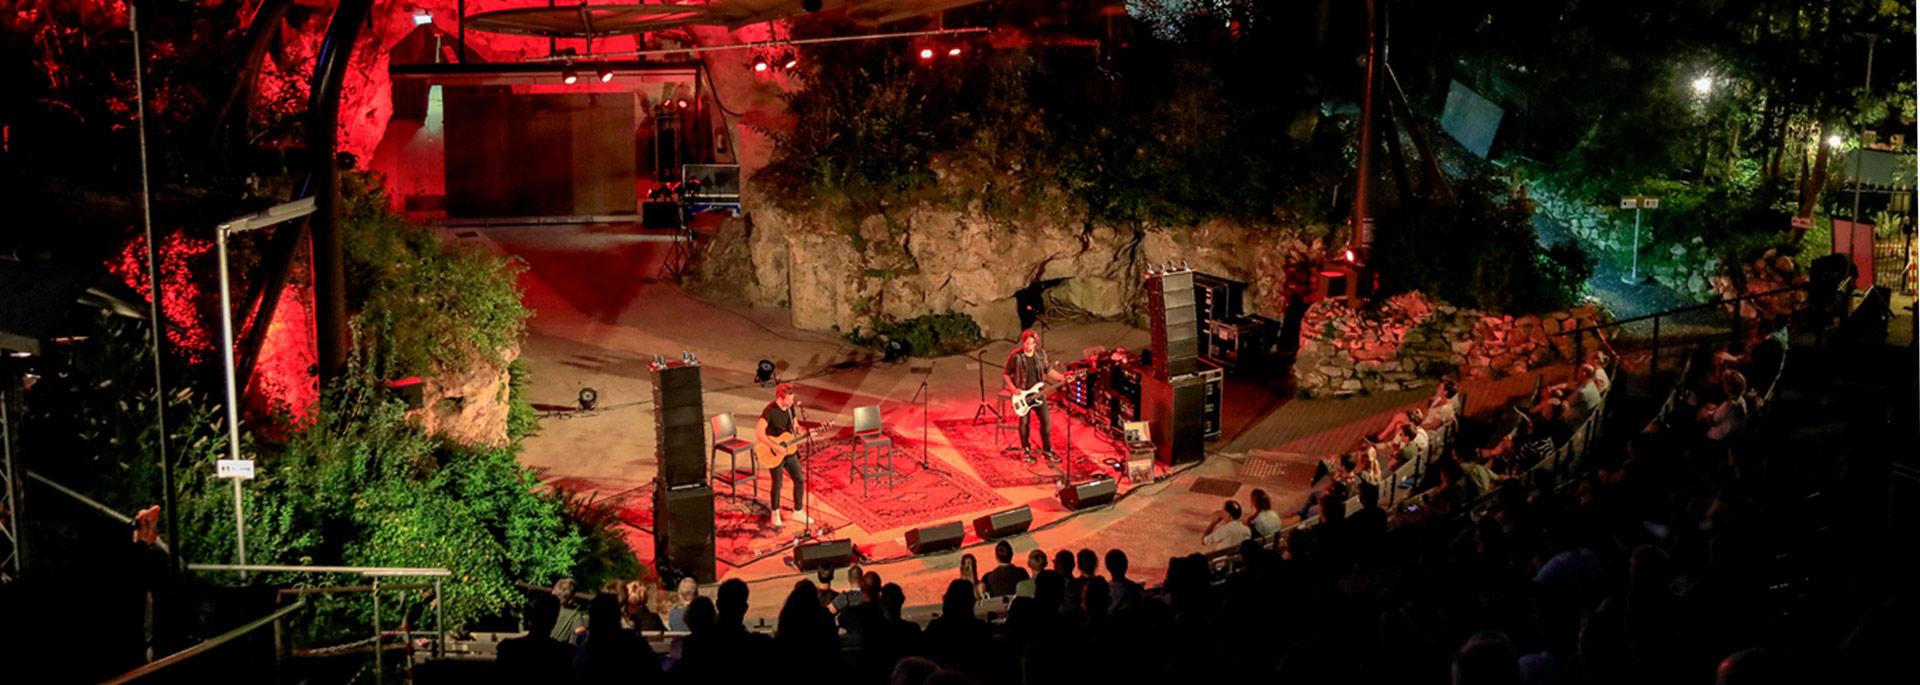 openlucht theater valkenburg op guitarpoll